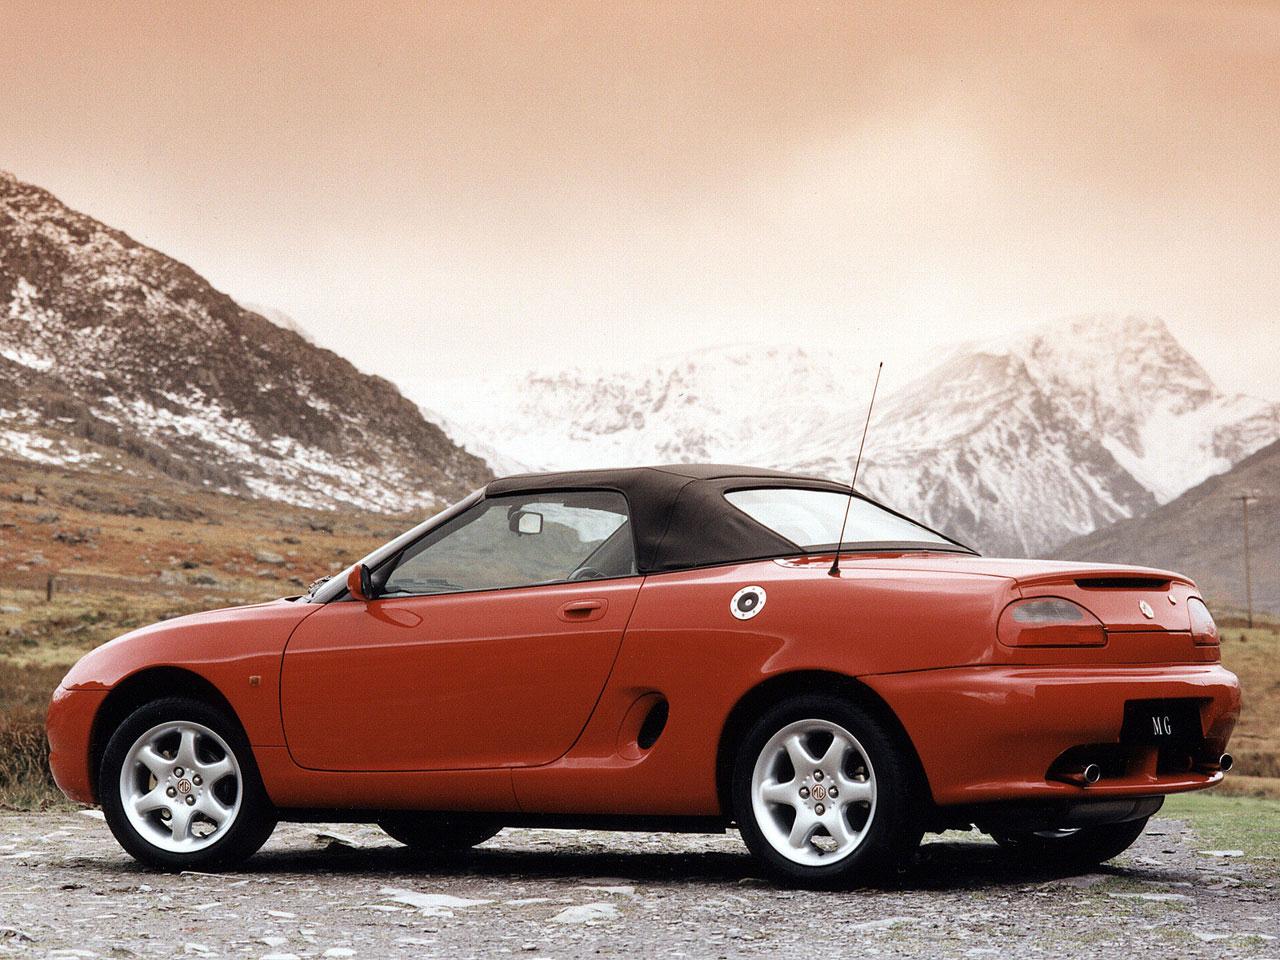 1995 MG F